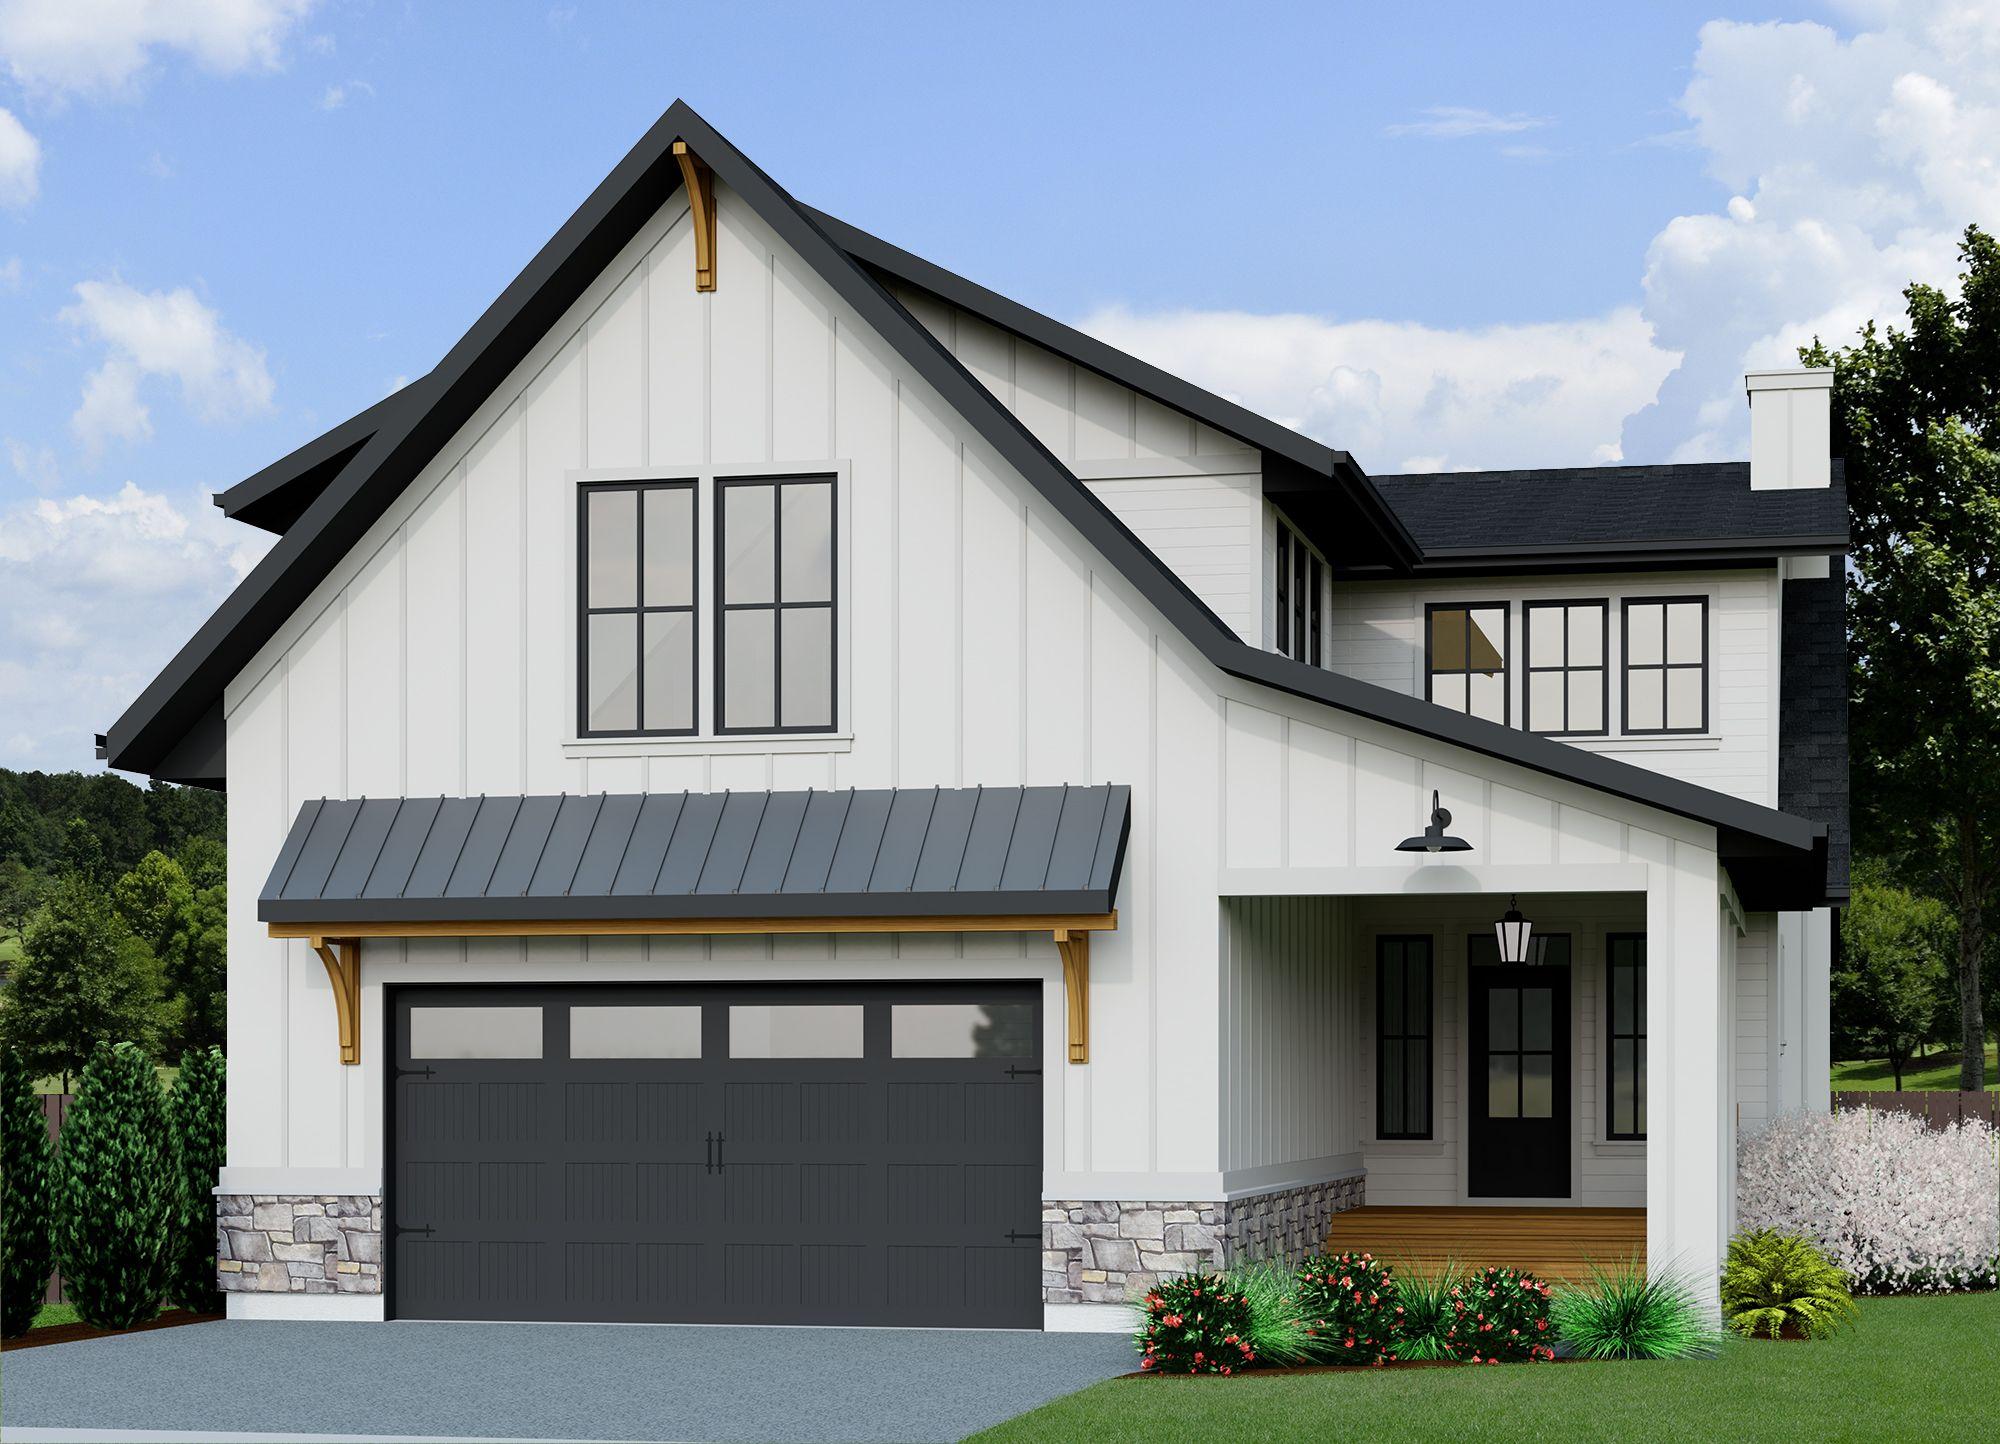 Modern Farmhouse Vantage2484 in 2020 Modern farmhouse